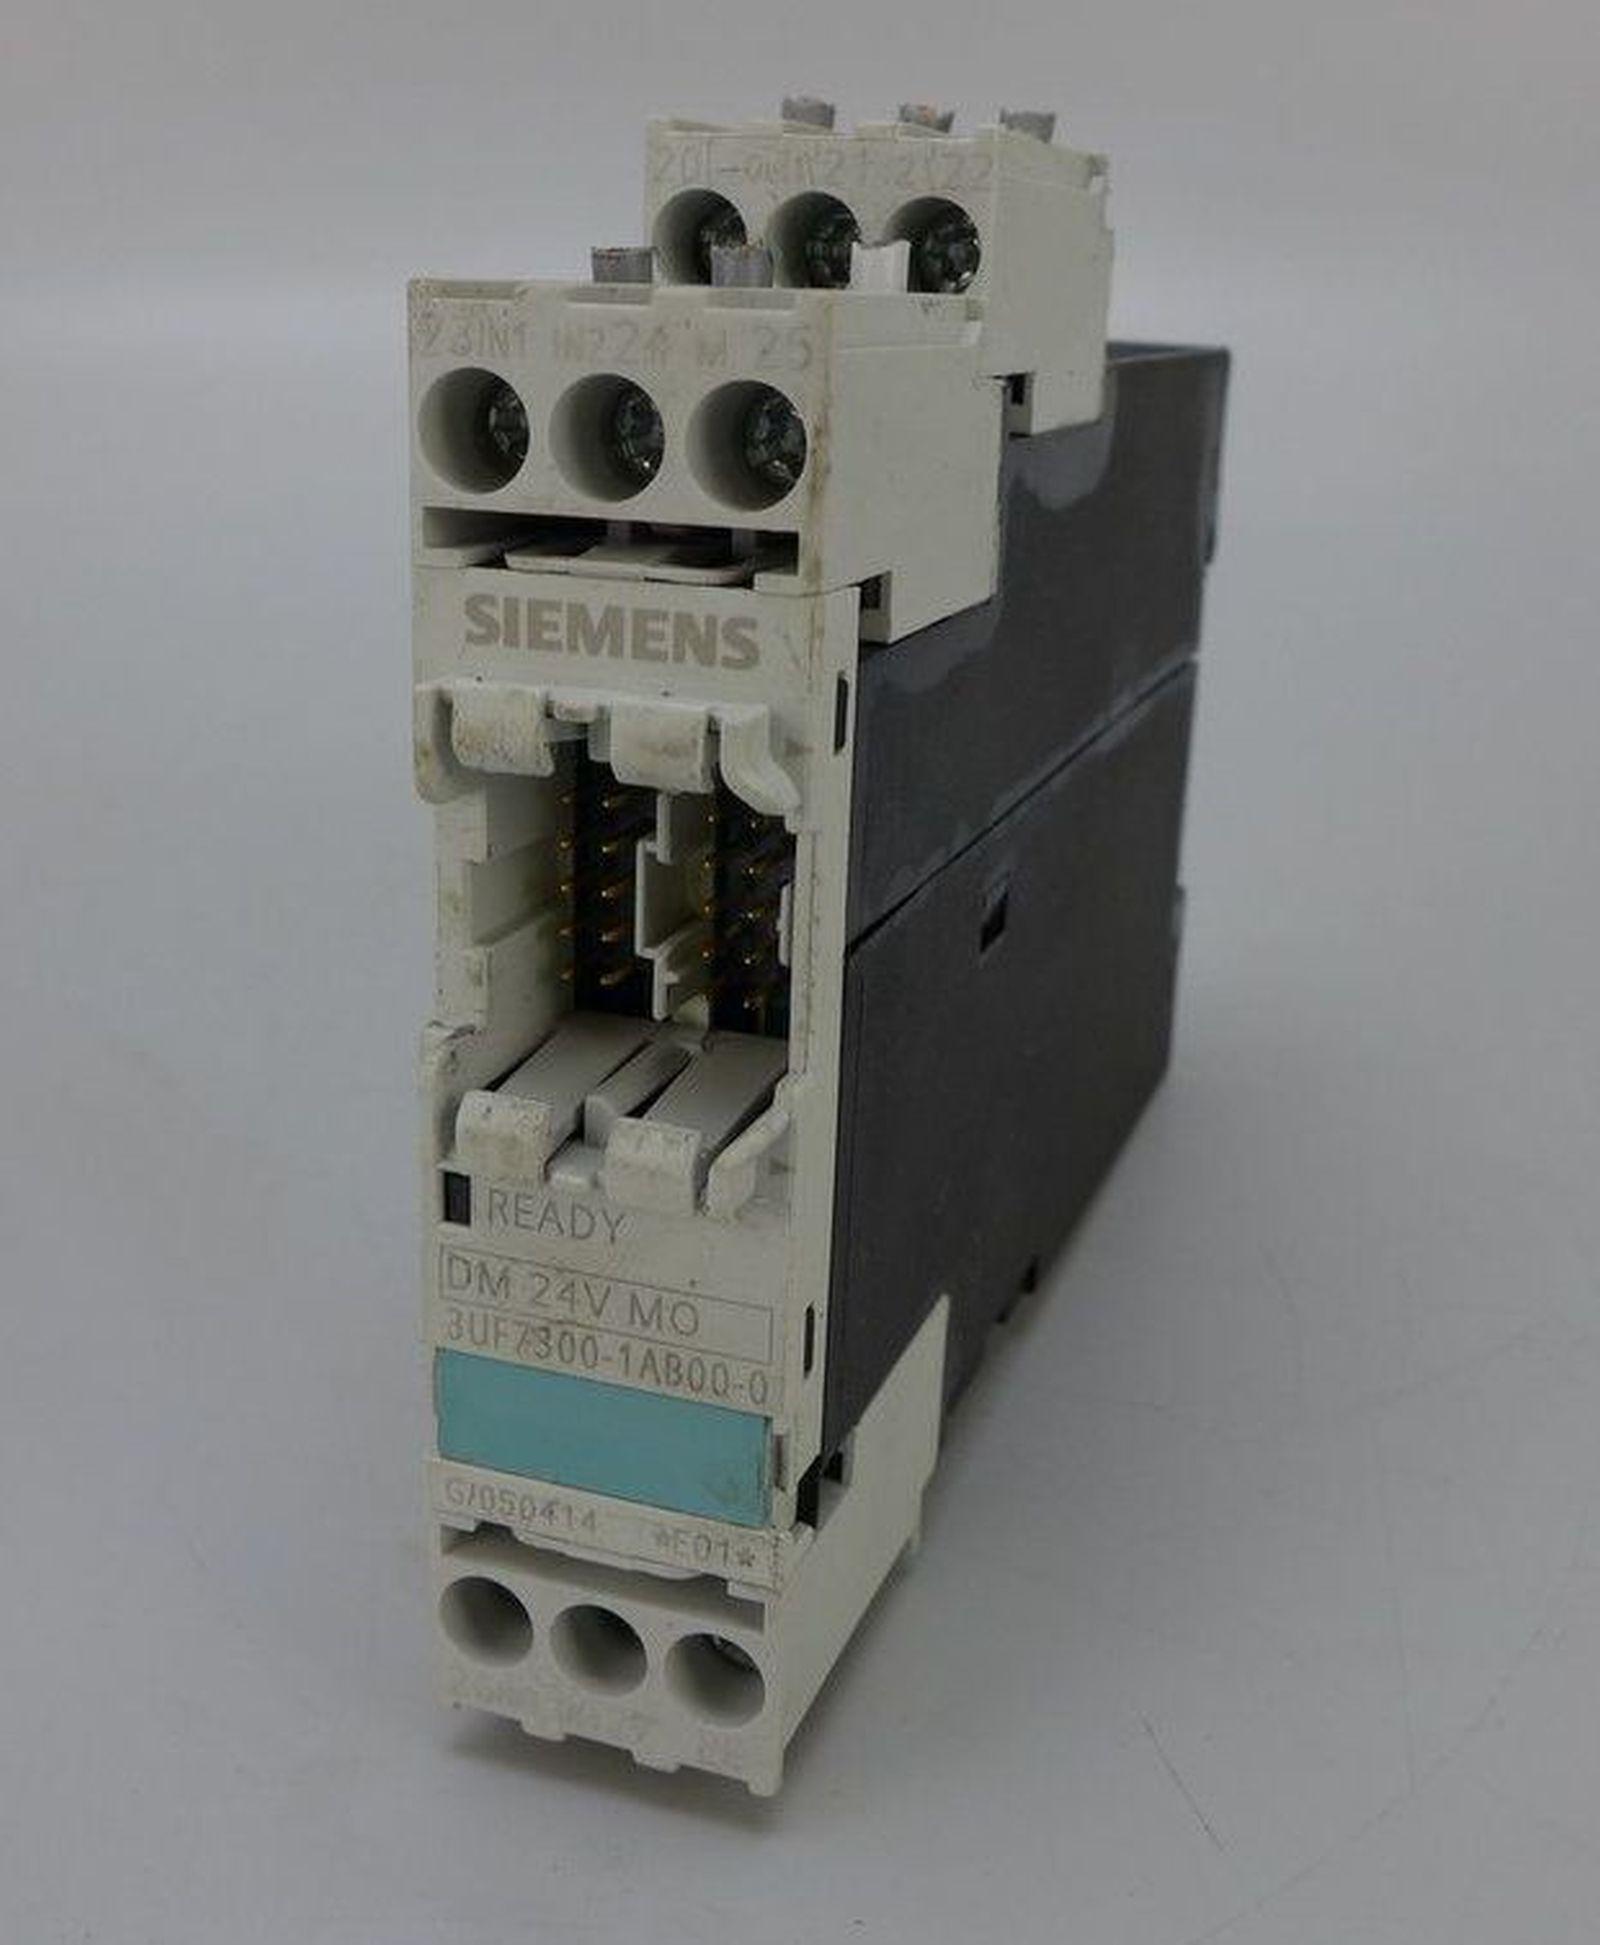 Automation, Antriebe & Motoren Business & Industrie Fein .mu54 Siemens Simadyn 6dd1681-0cd0 Se23